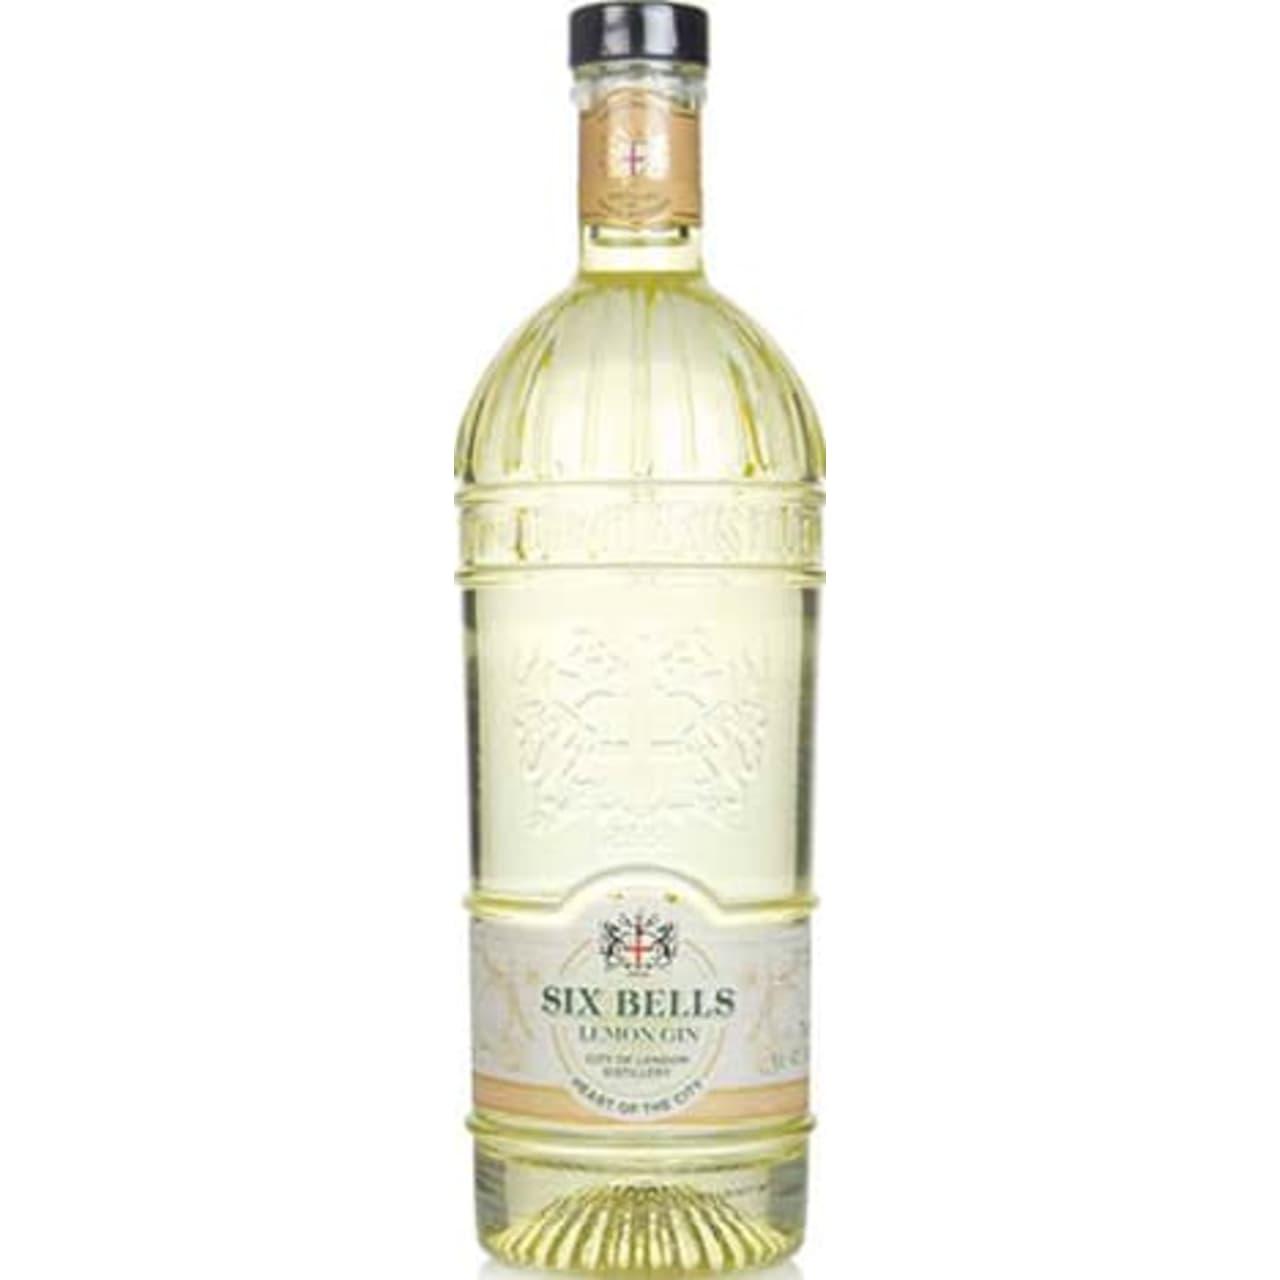 Product Image - City of London Six Bells Lemon Gin